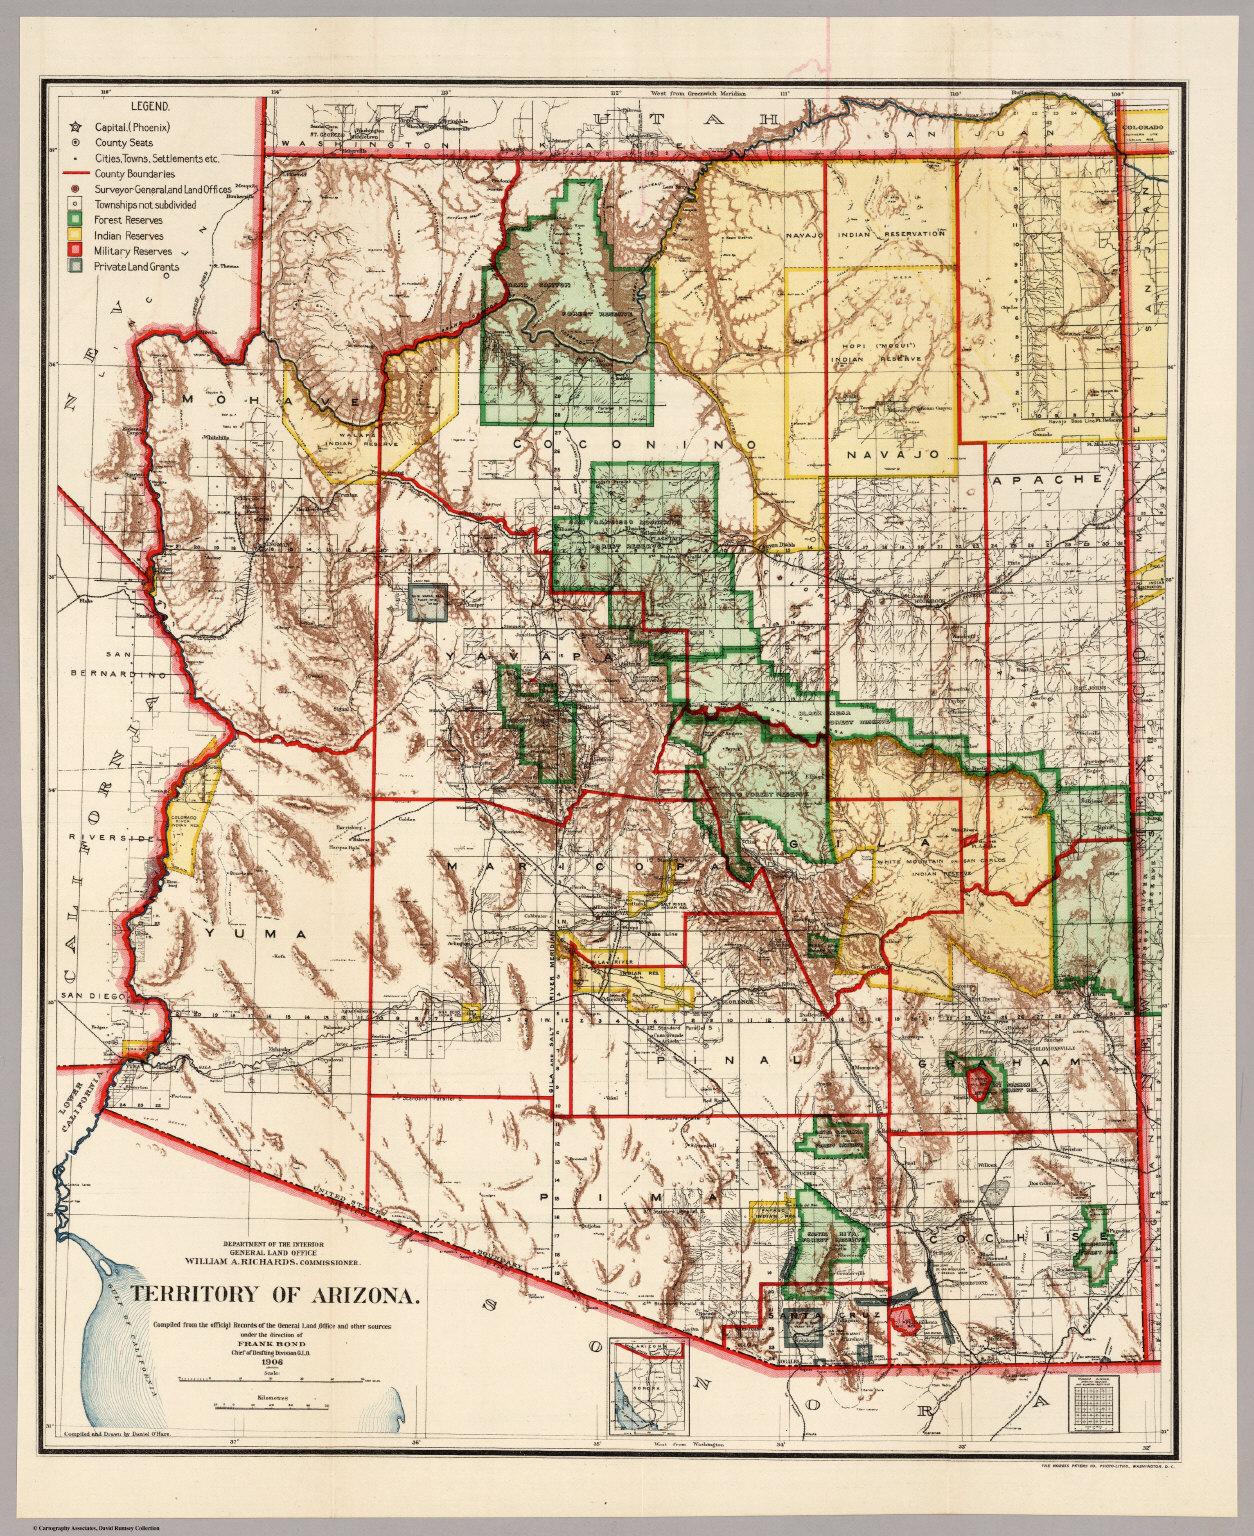 Territory of Arizona, 1906 - David Rumsey Historical Map ... on general map of georgia, general map of florida, general map of manhattan, general map of idaho, general map of paris,